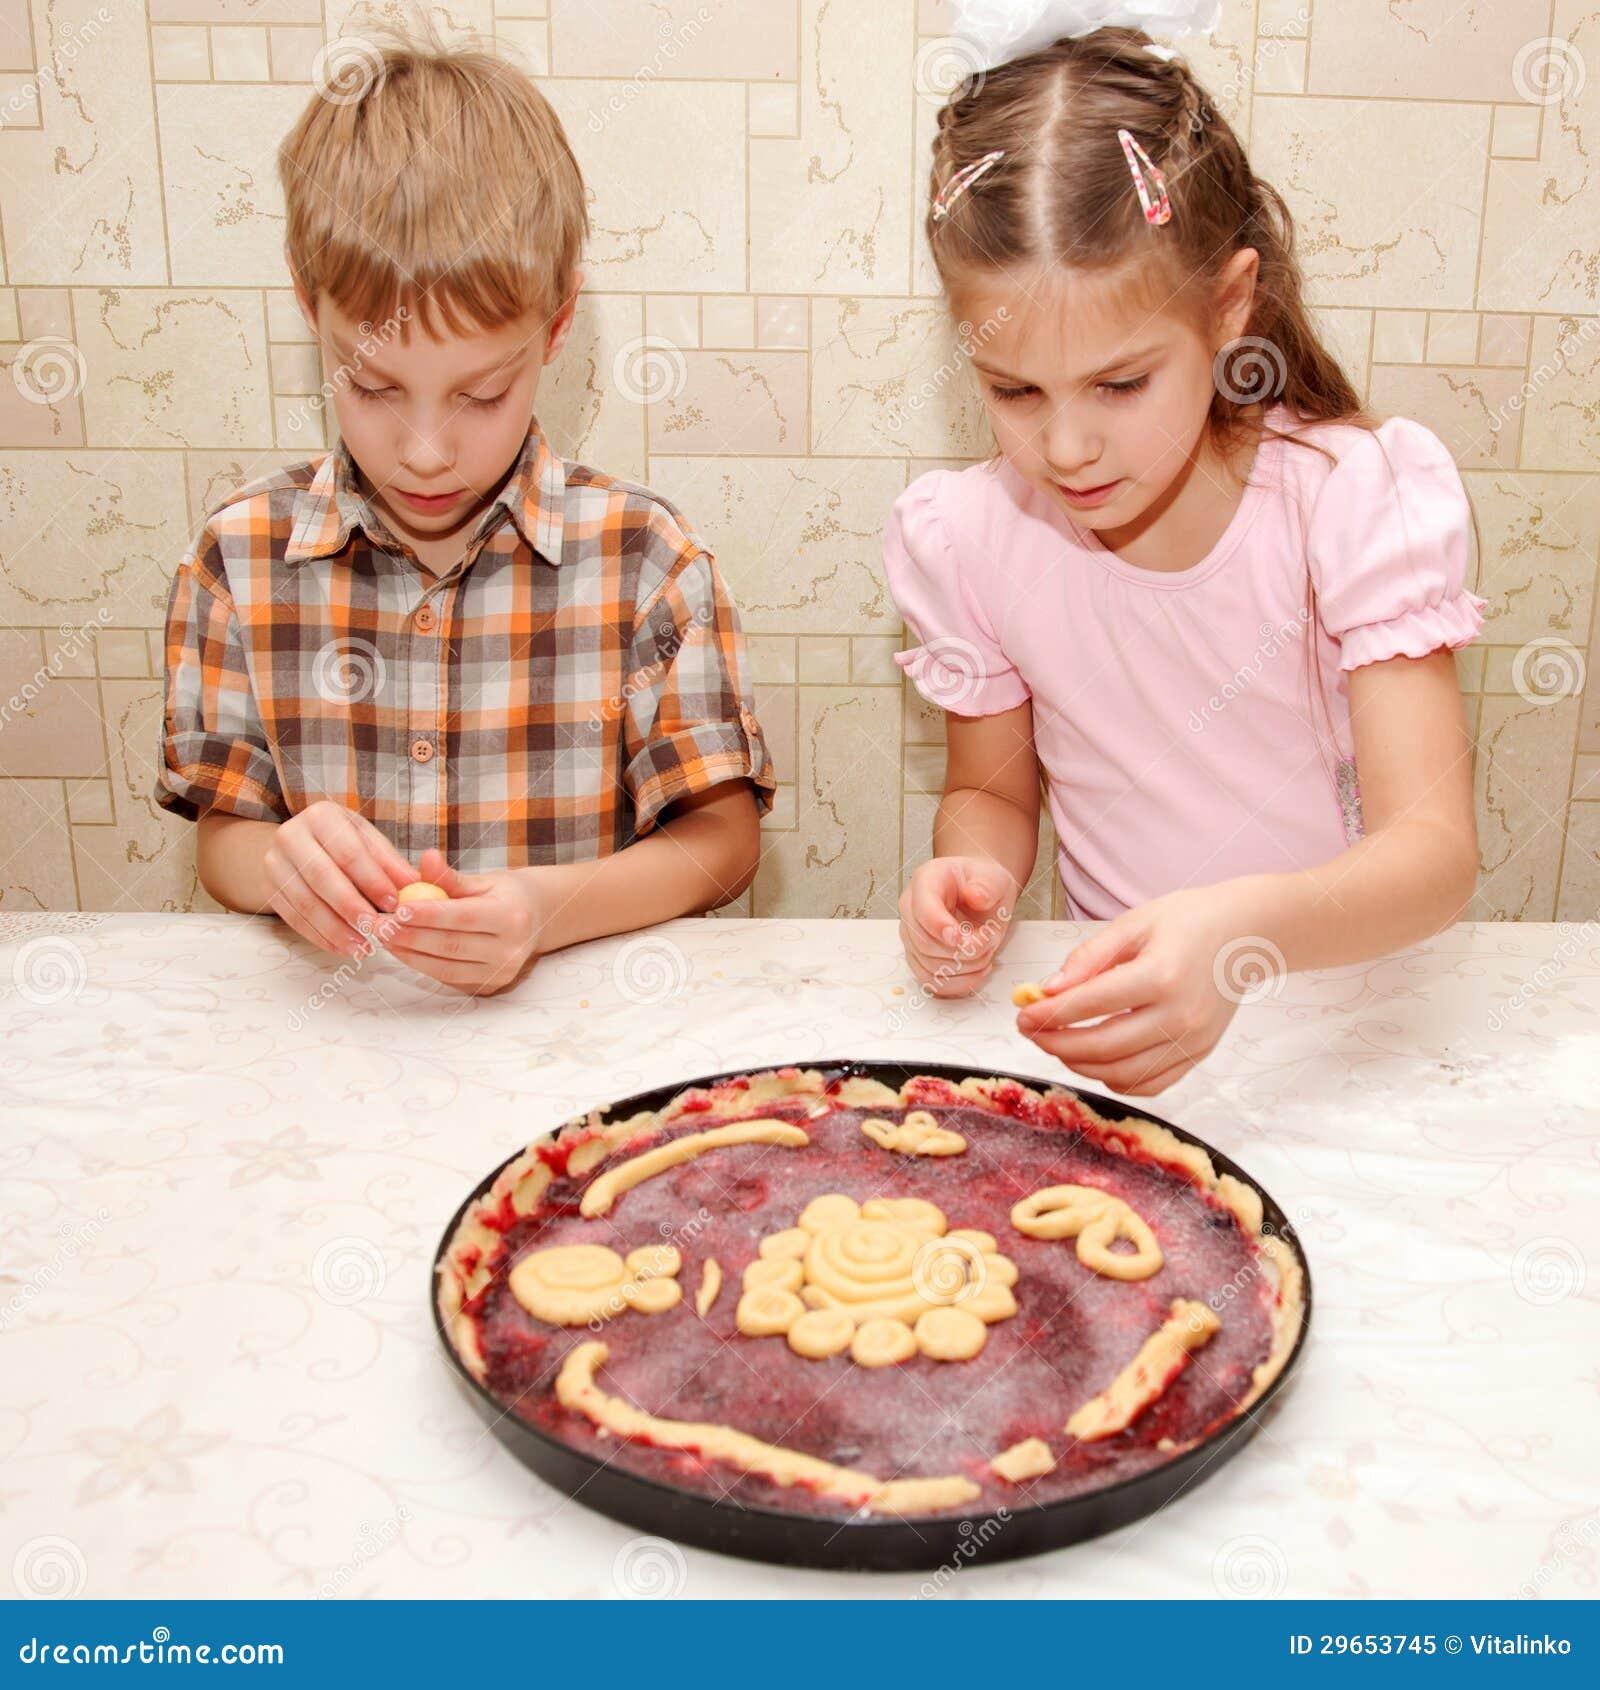 Bake A Cake Borther And Sister